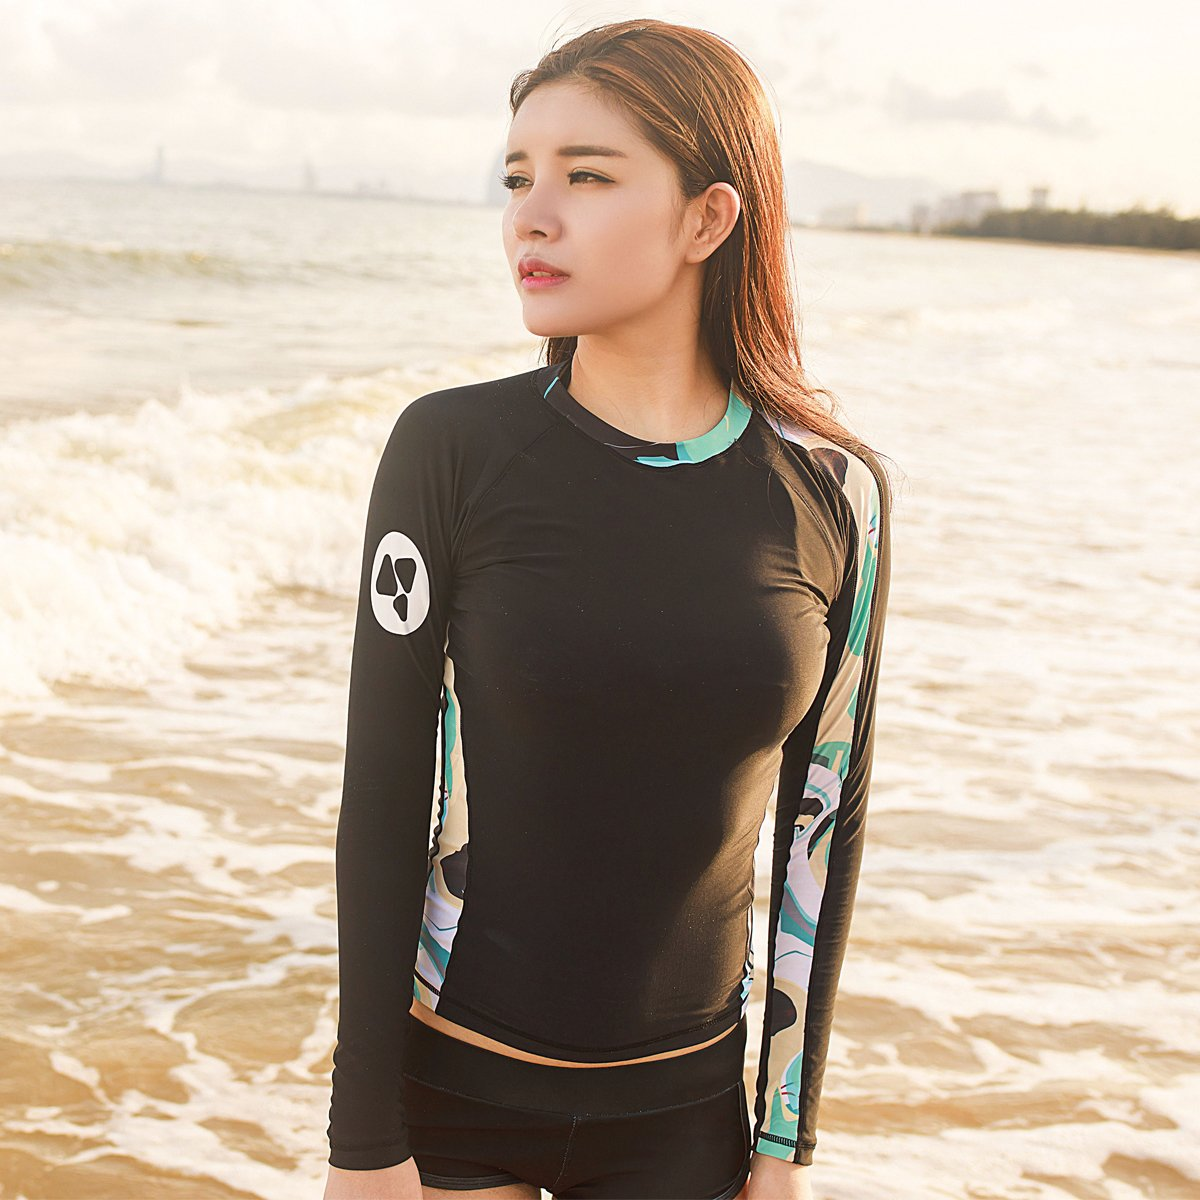 ALEEYA Rash Guard Women Long Sleeves Swimsuit Swimwear Diving Surfing Kayaking Boating Swimming Rashguards UV Protection T-Shirt Bathing Suit Quick Dry Fitness Yoga Beach Pools Rash Guard Lady